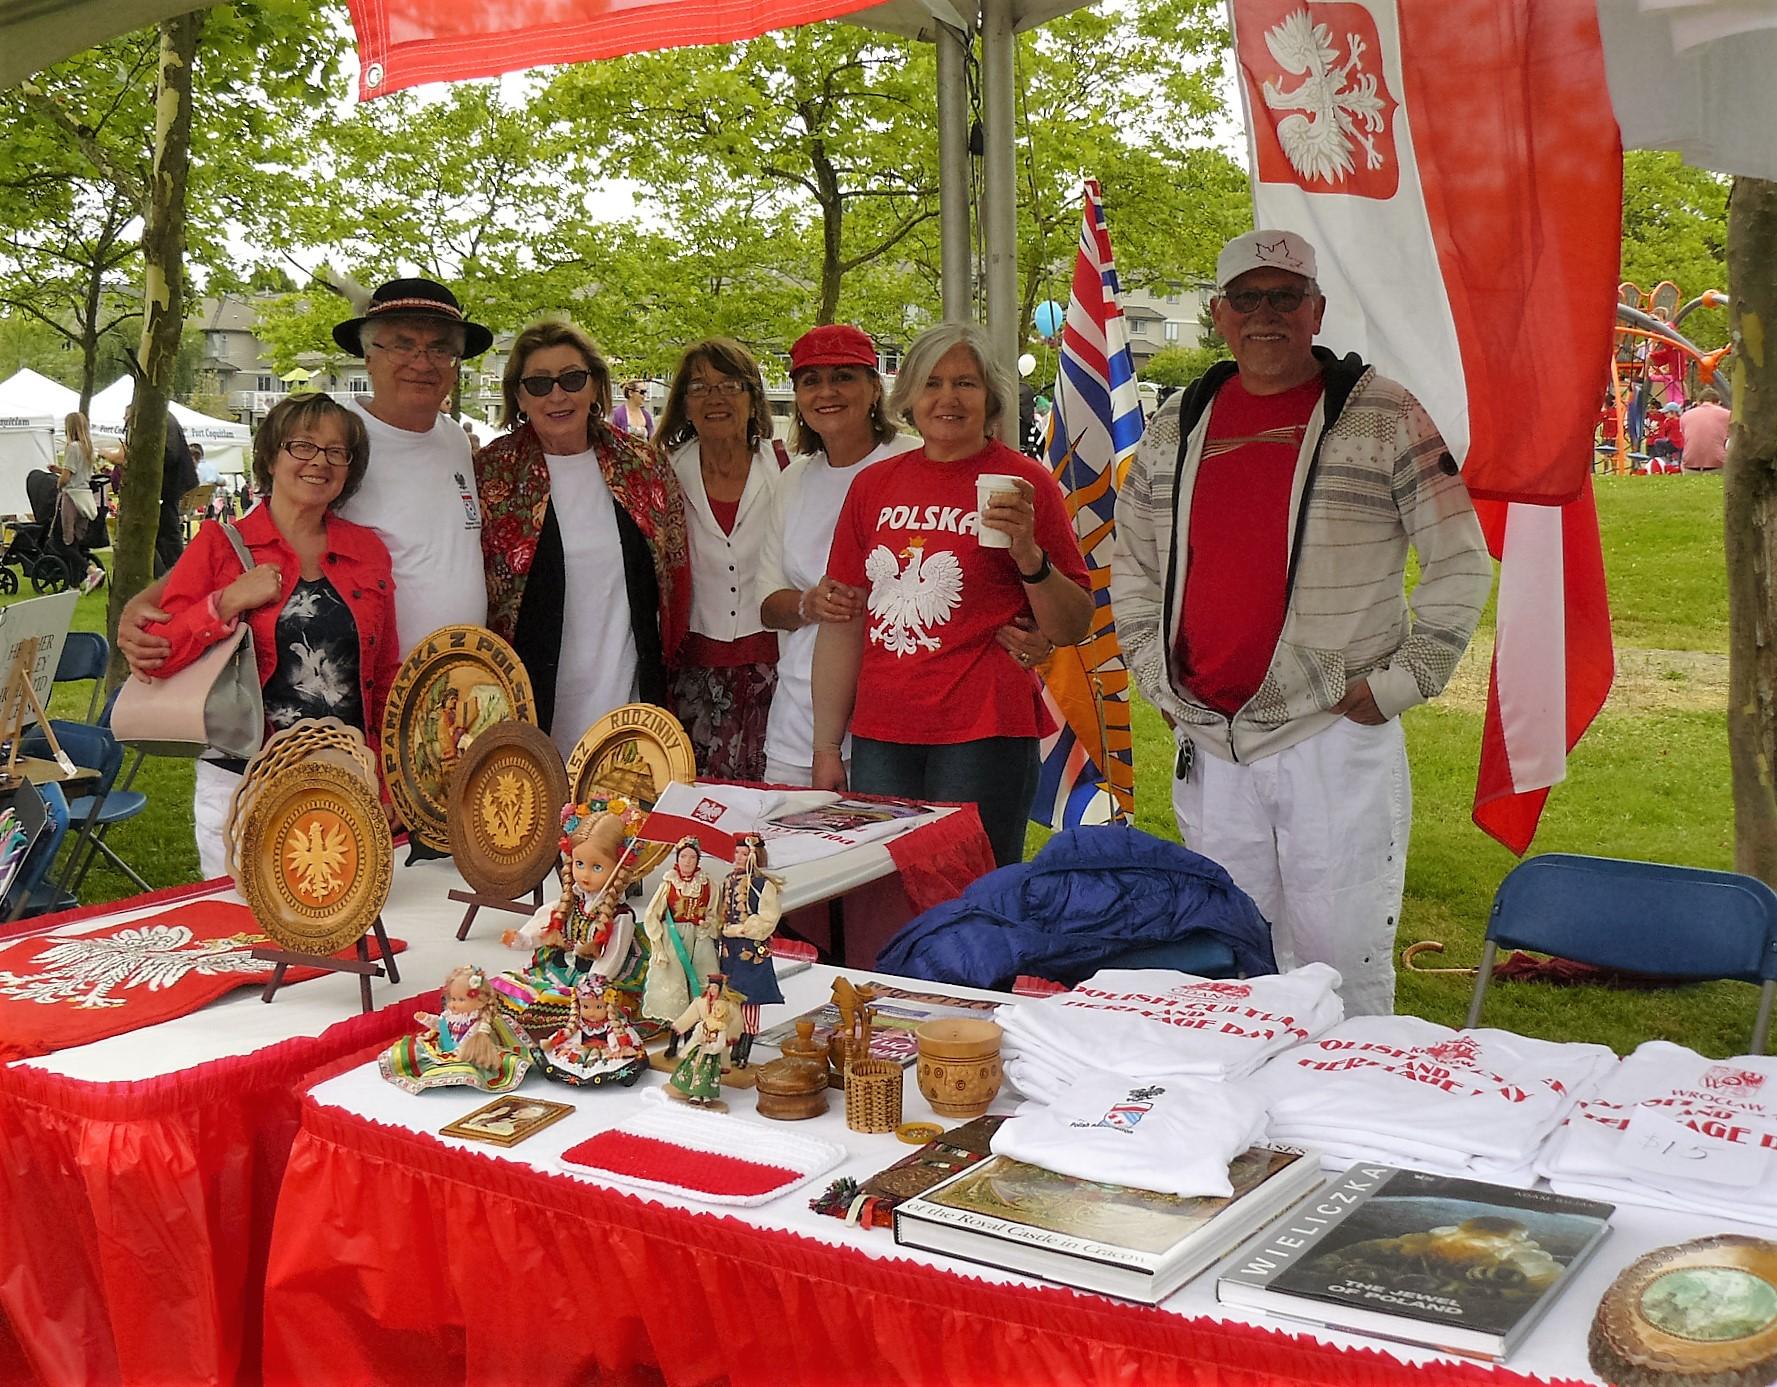 Tri-City Polonez Association